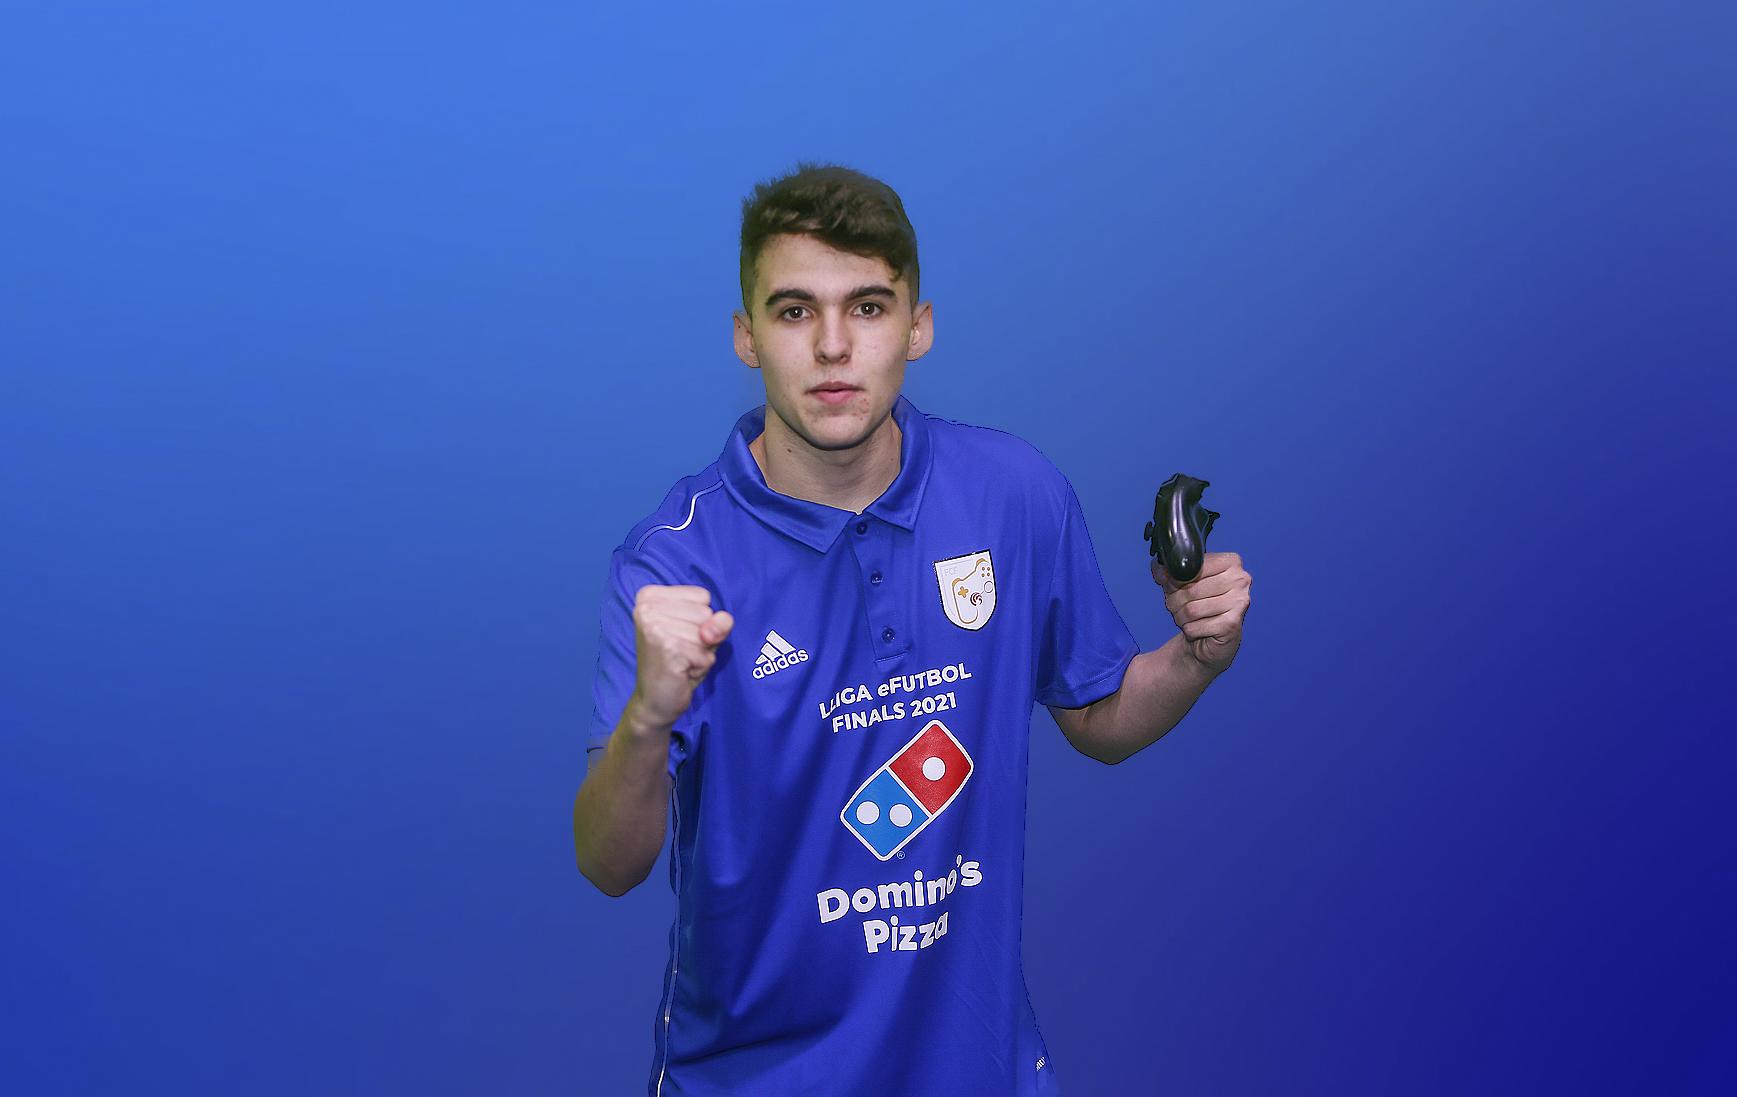 Jordi Martínez